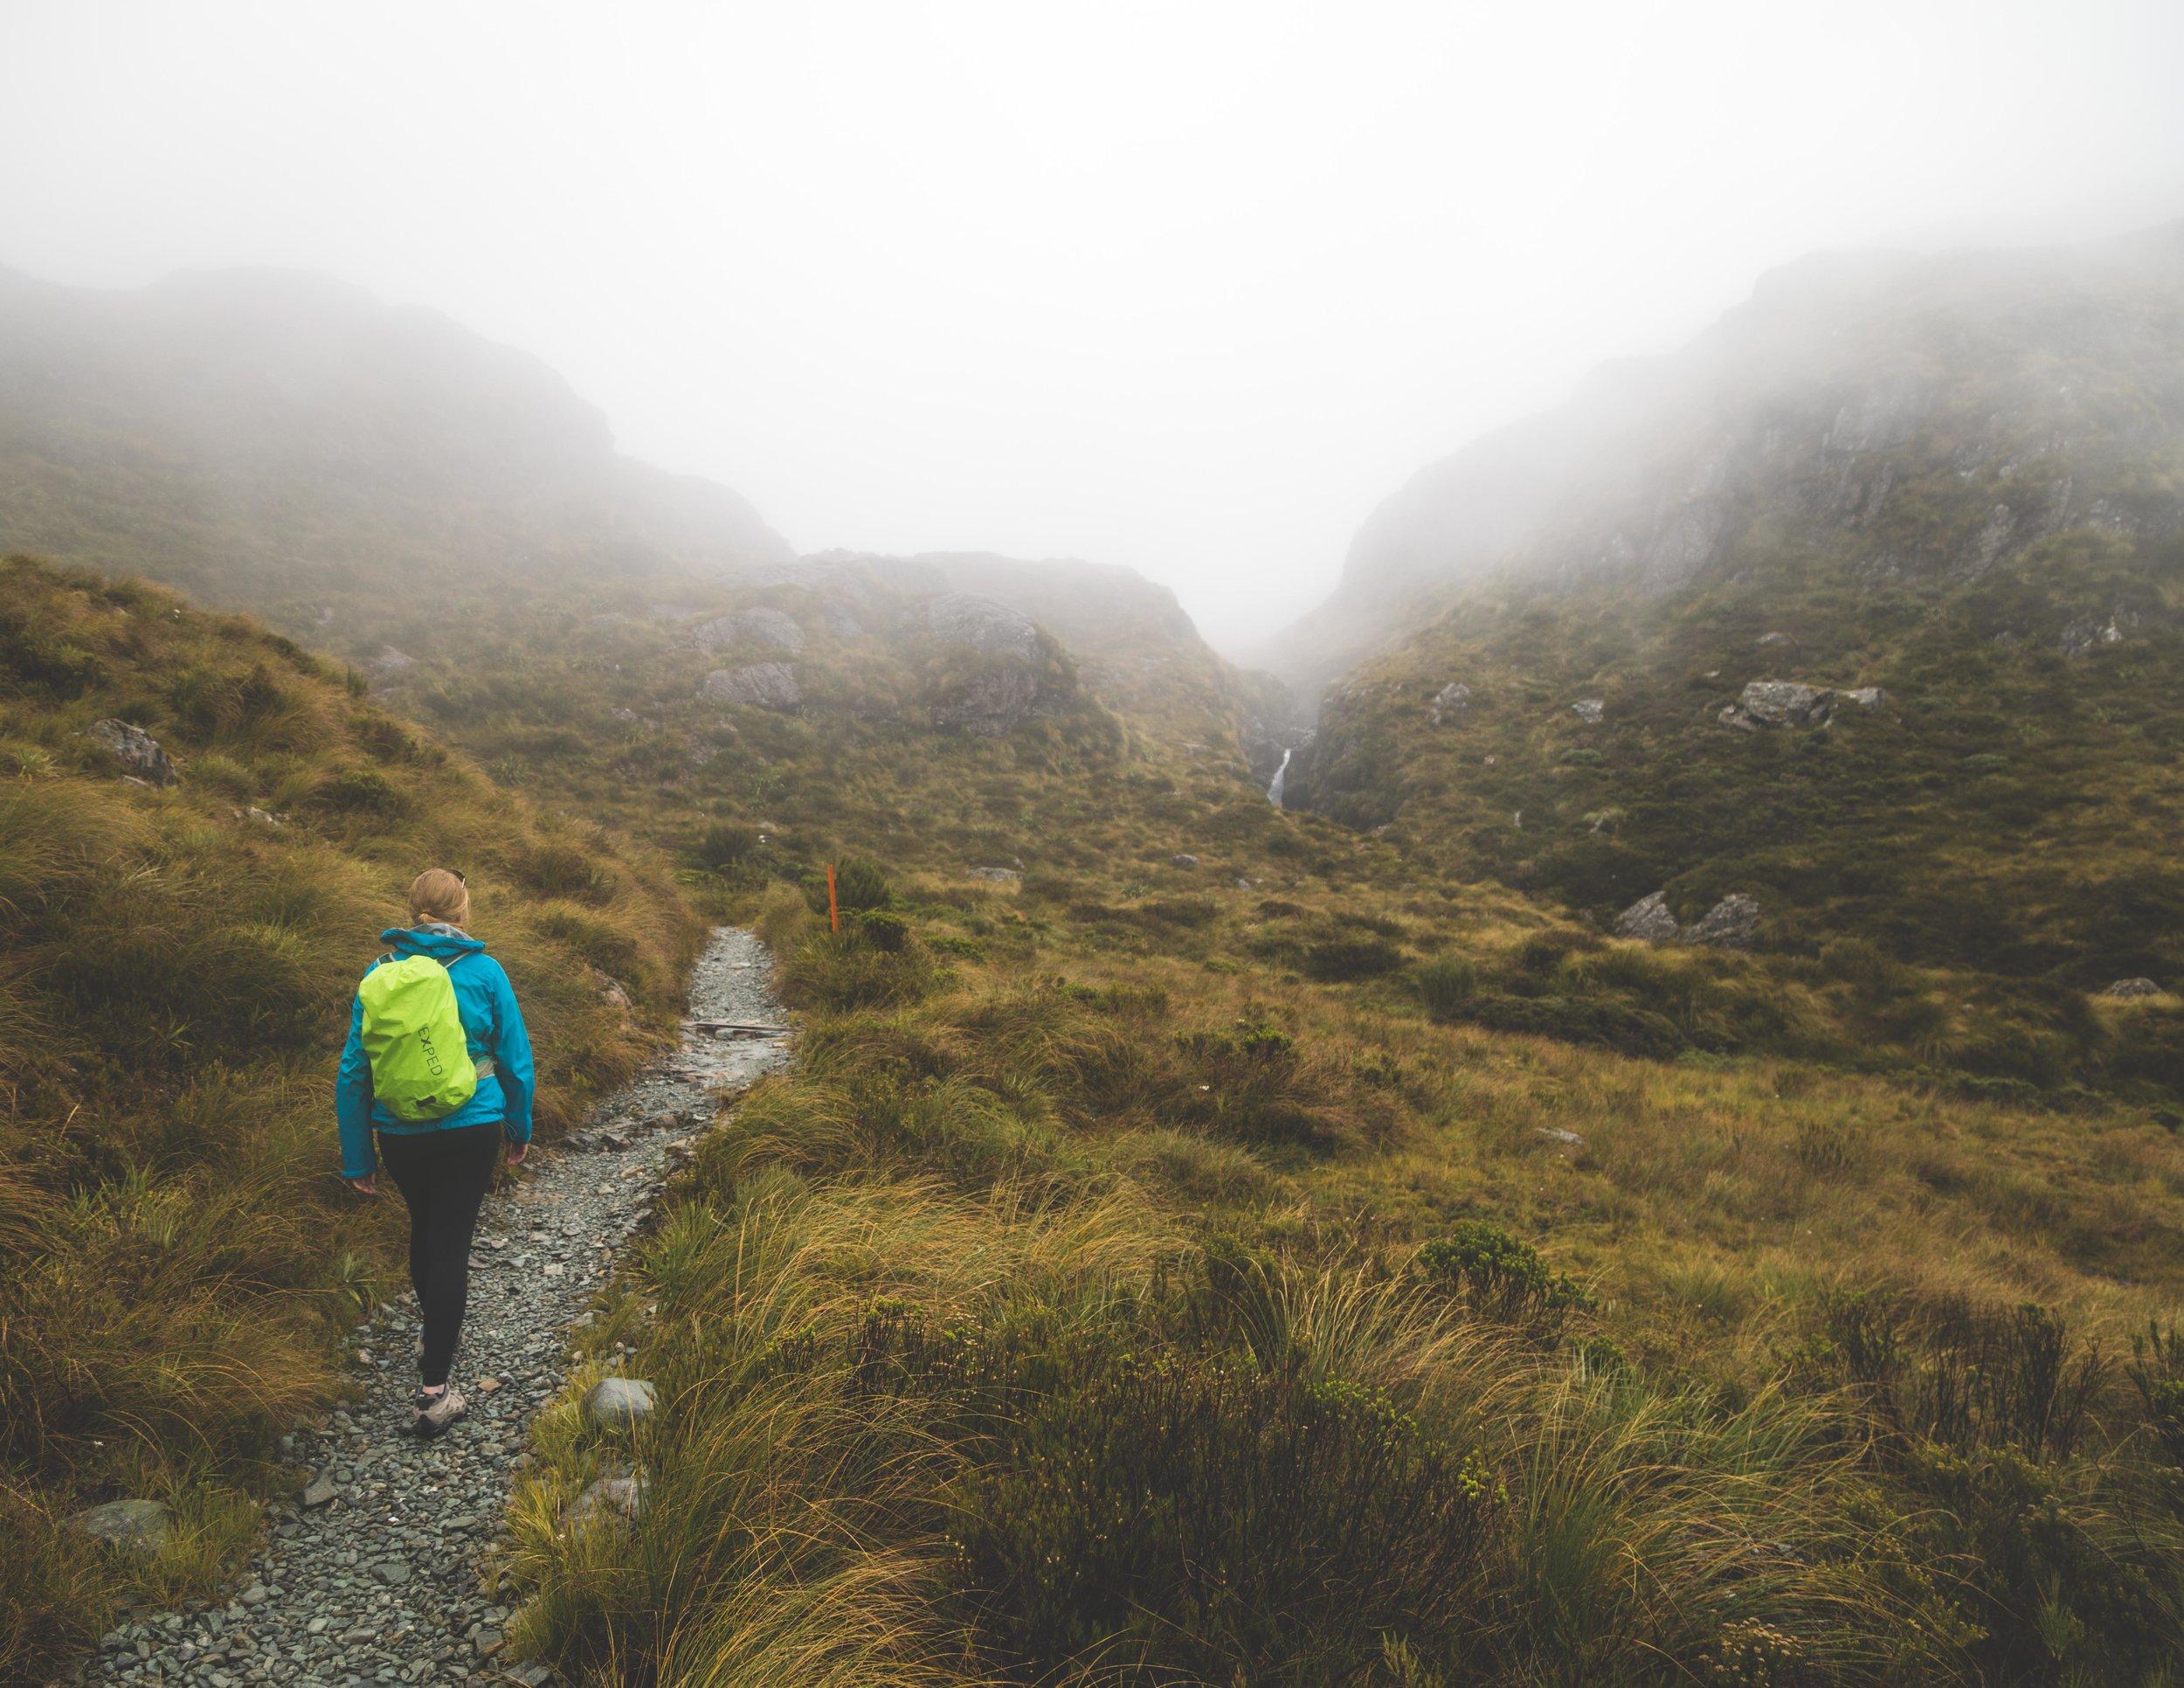 The Routeburn Track: Hiking to Harris Saddle